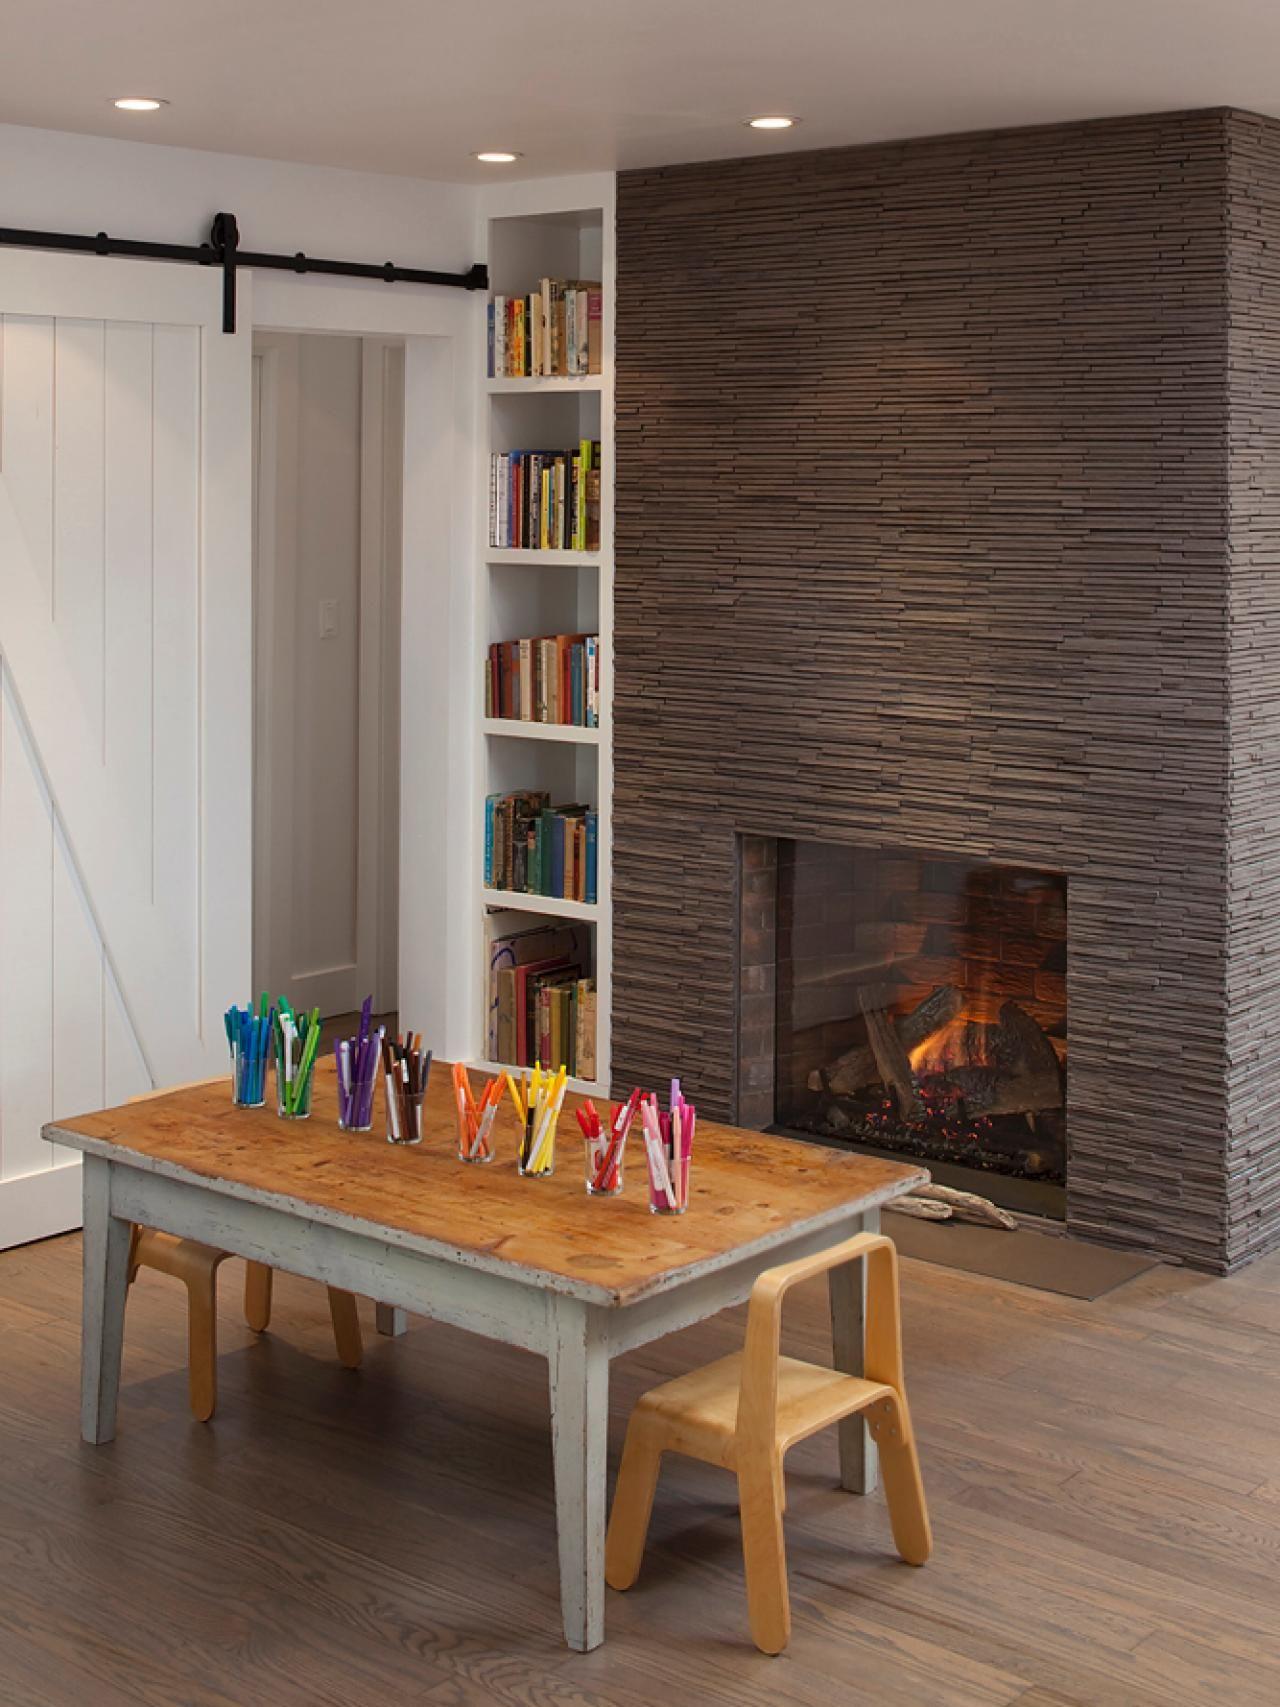 Rough cut porcelain tile surrounds the fireplace and mimics the look rough cut porcelain tile surrounds the fireplace and mimics the look of lagos azul limestone dailygadgetfo Image collections